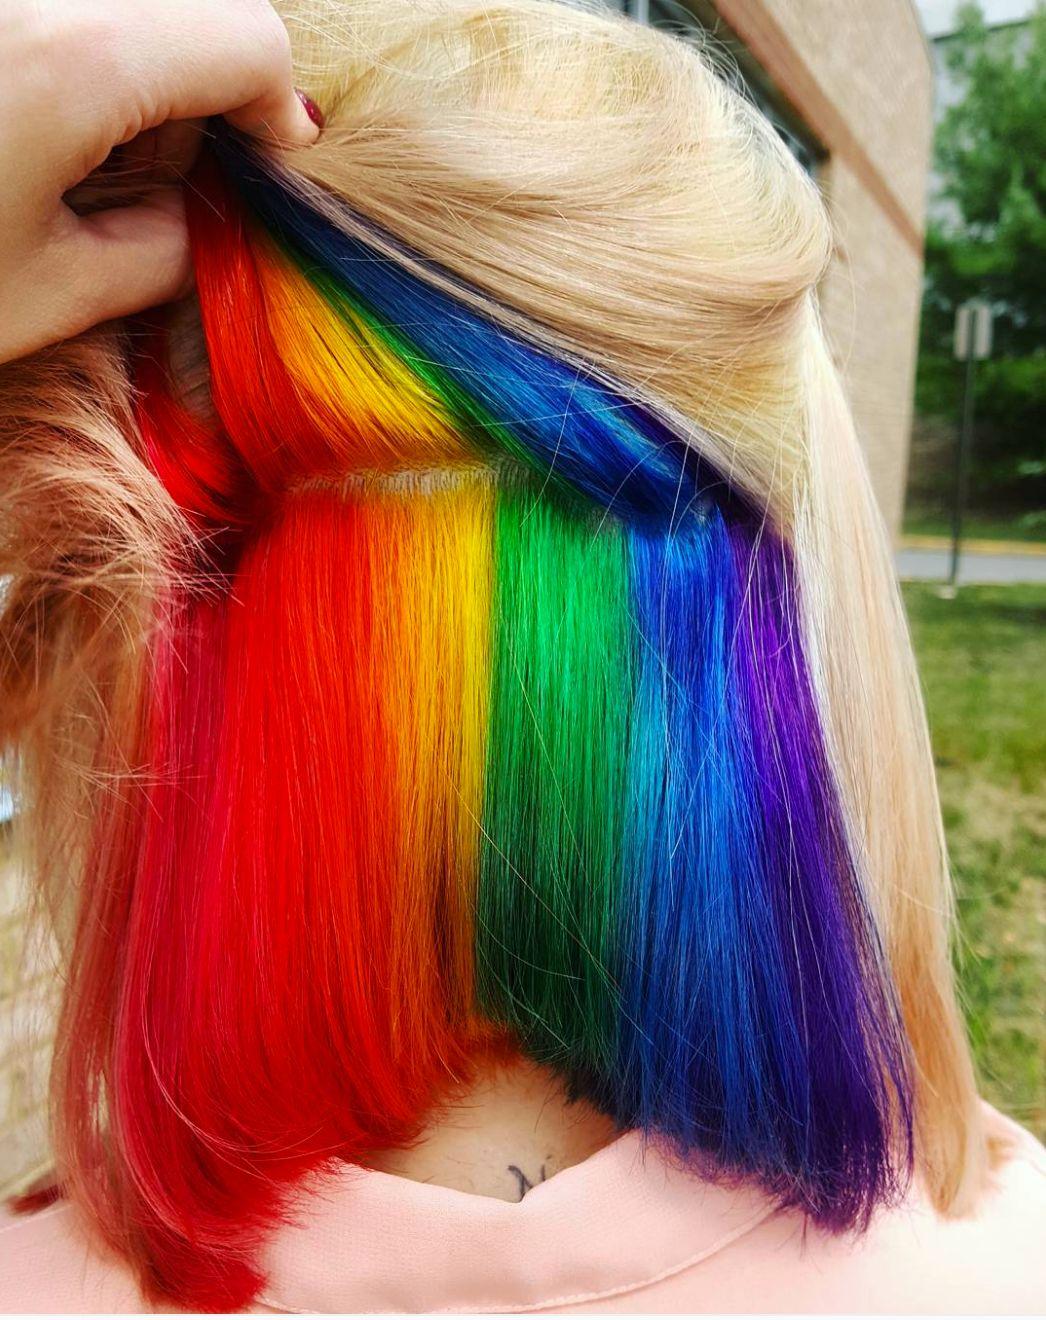 'Hidden Rainbow' Hair Is A Trend You Won't See